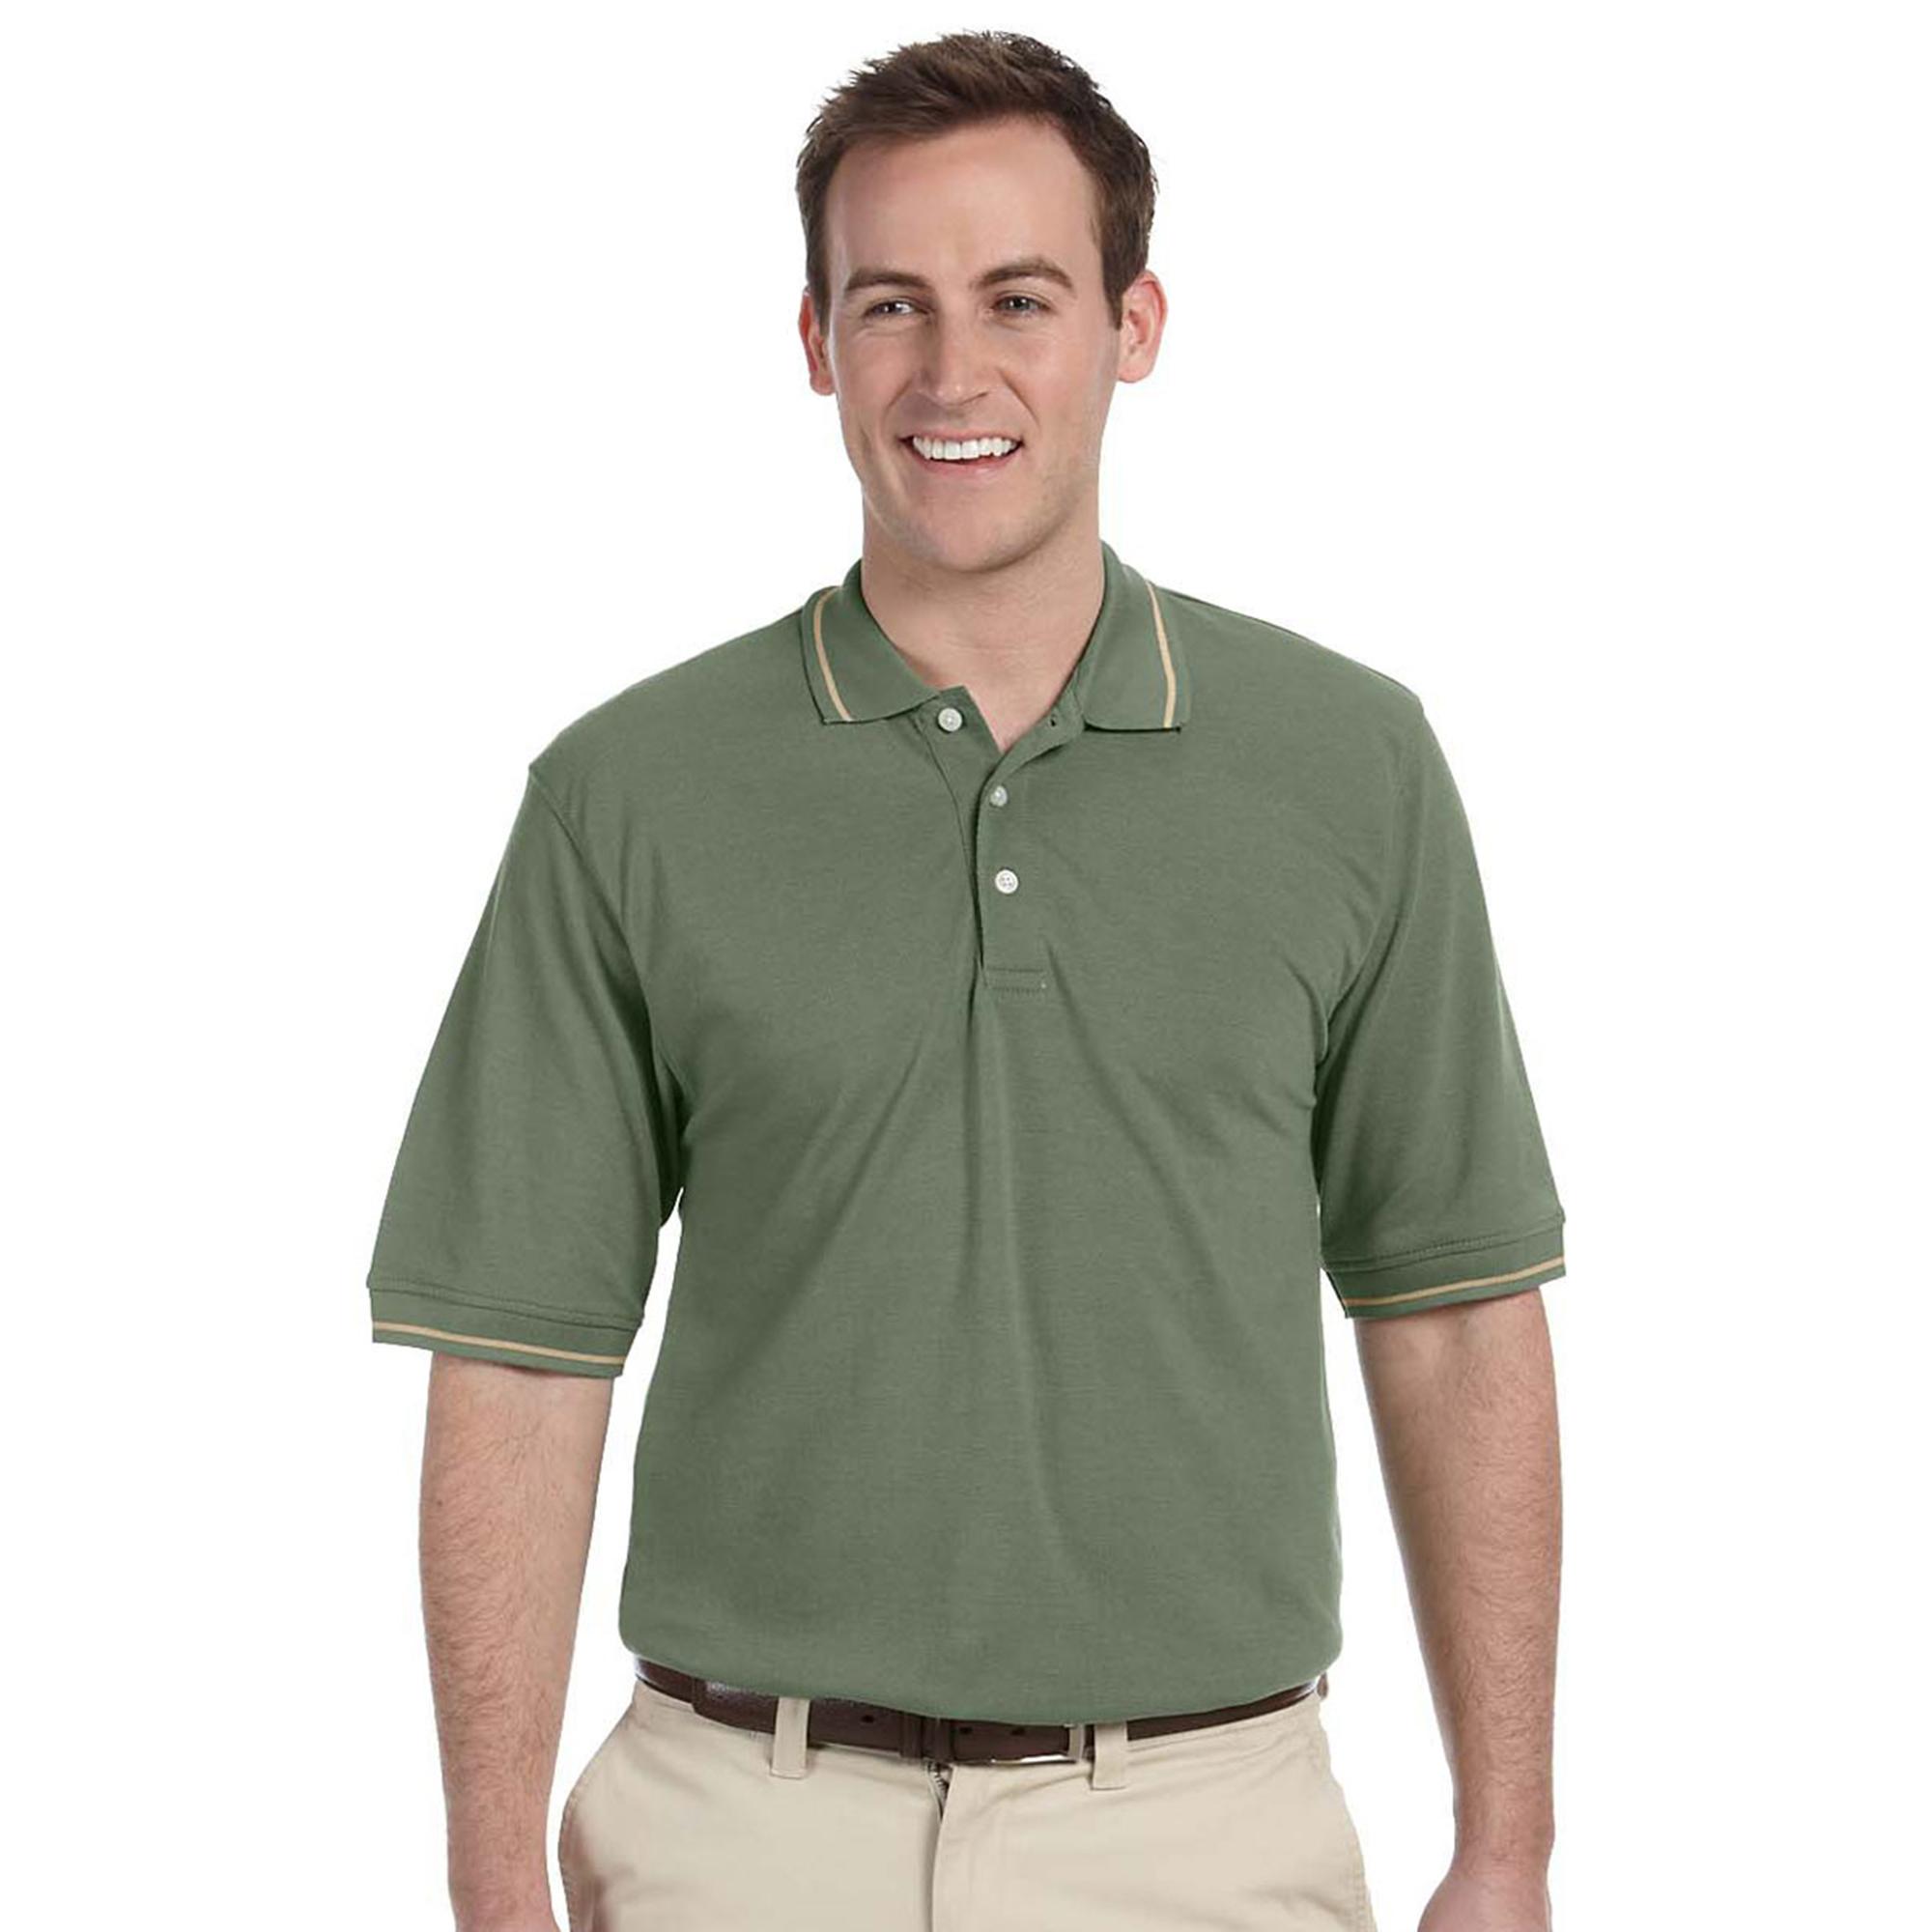 Harriton M270 Men's Knit Collar Button Polo Shirt at Sears.com